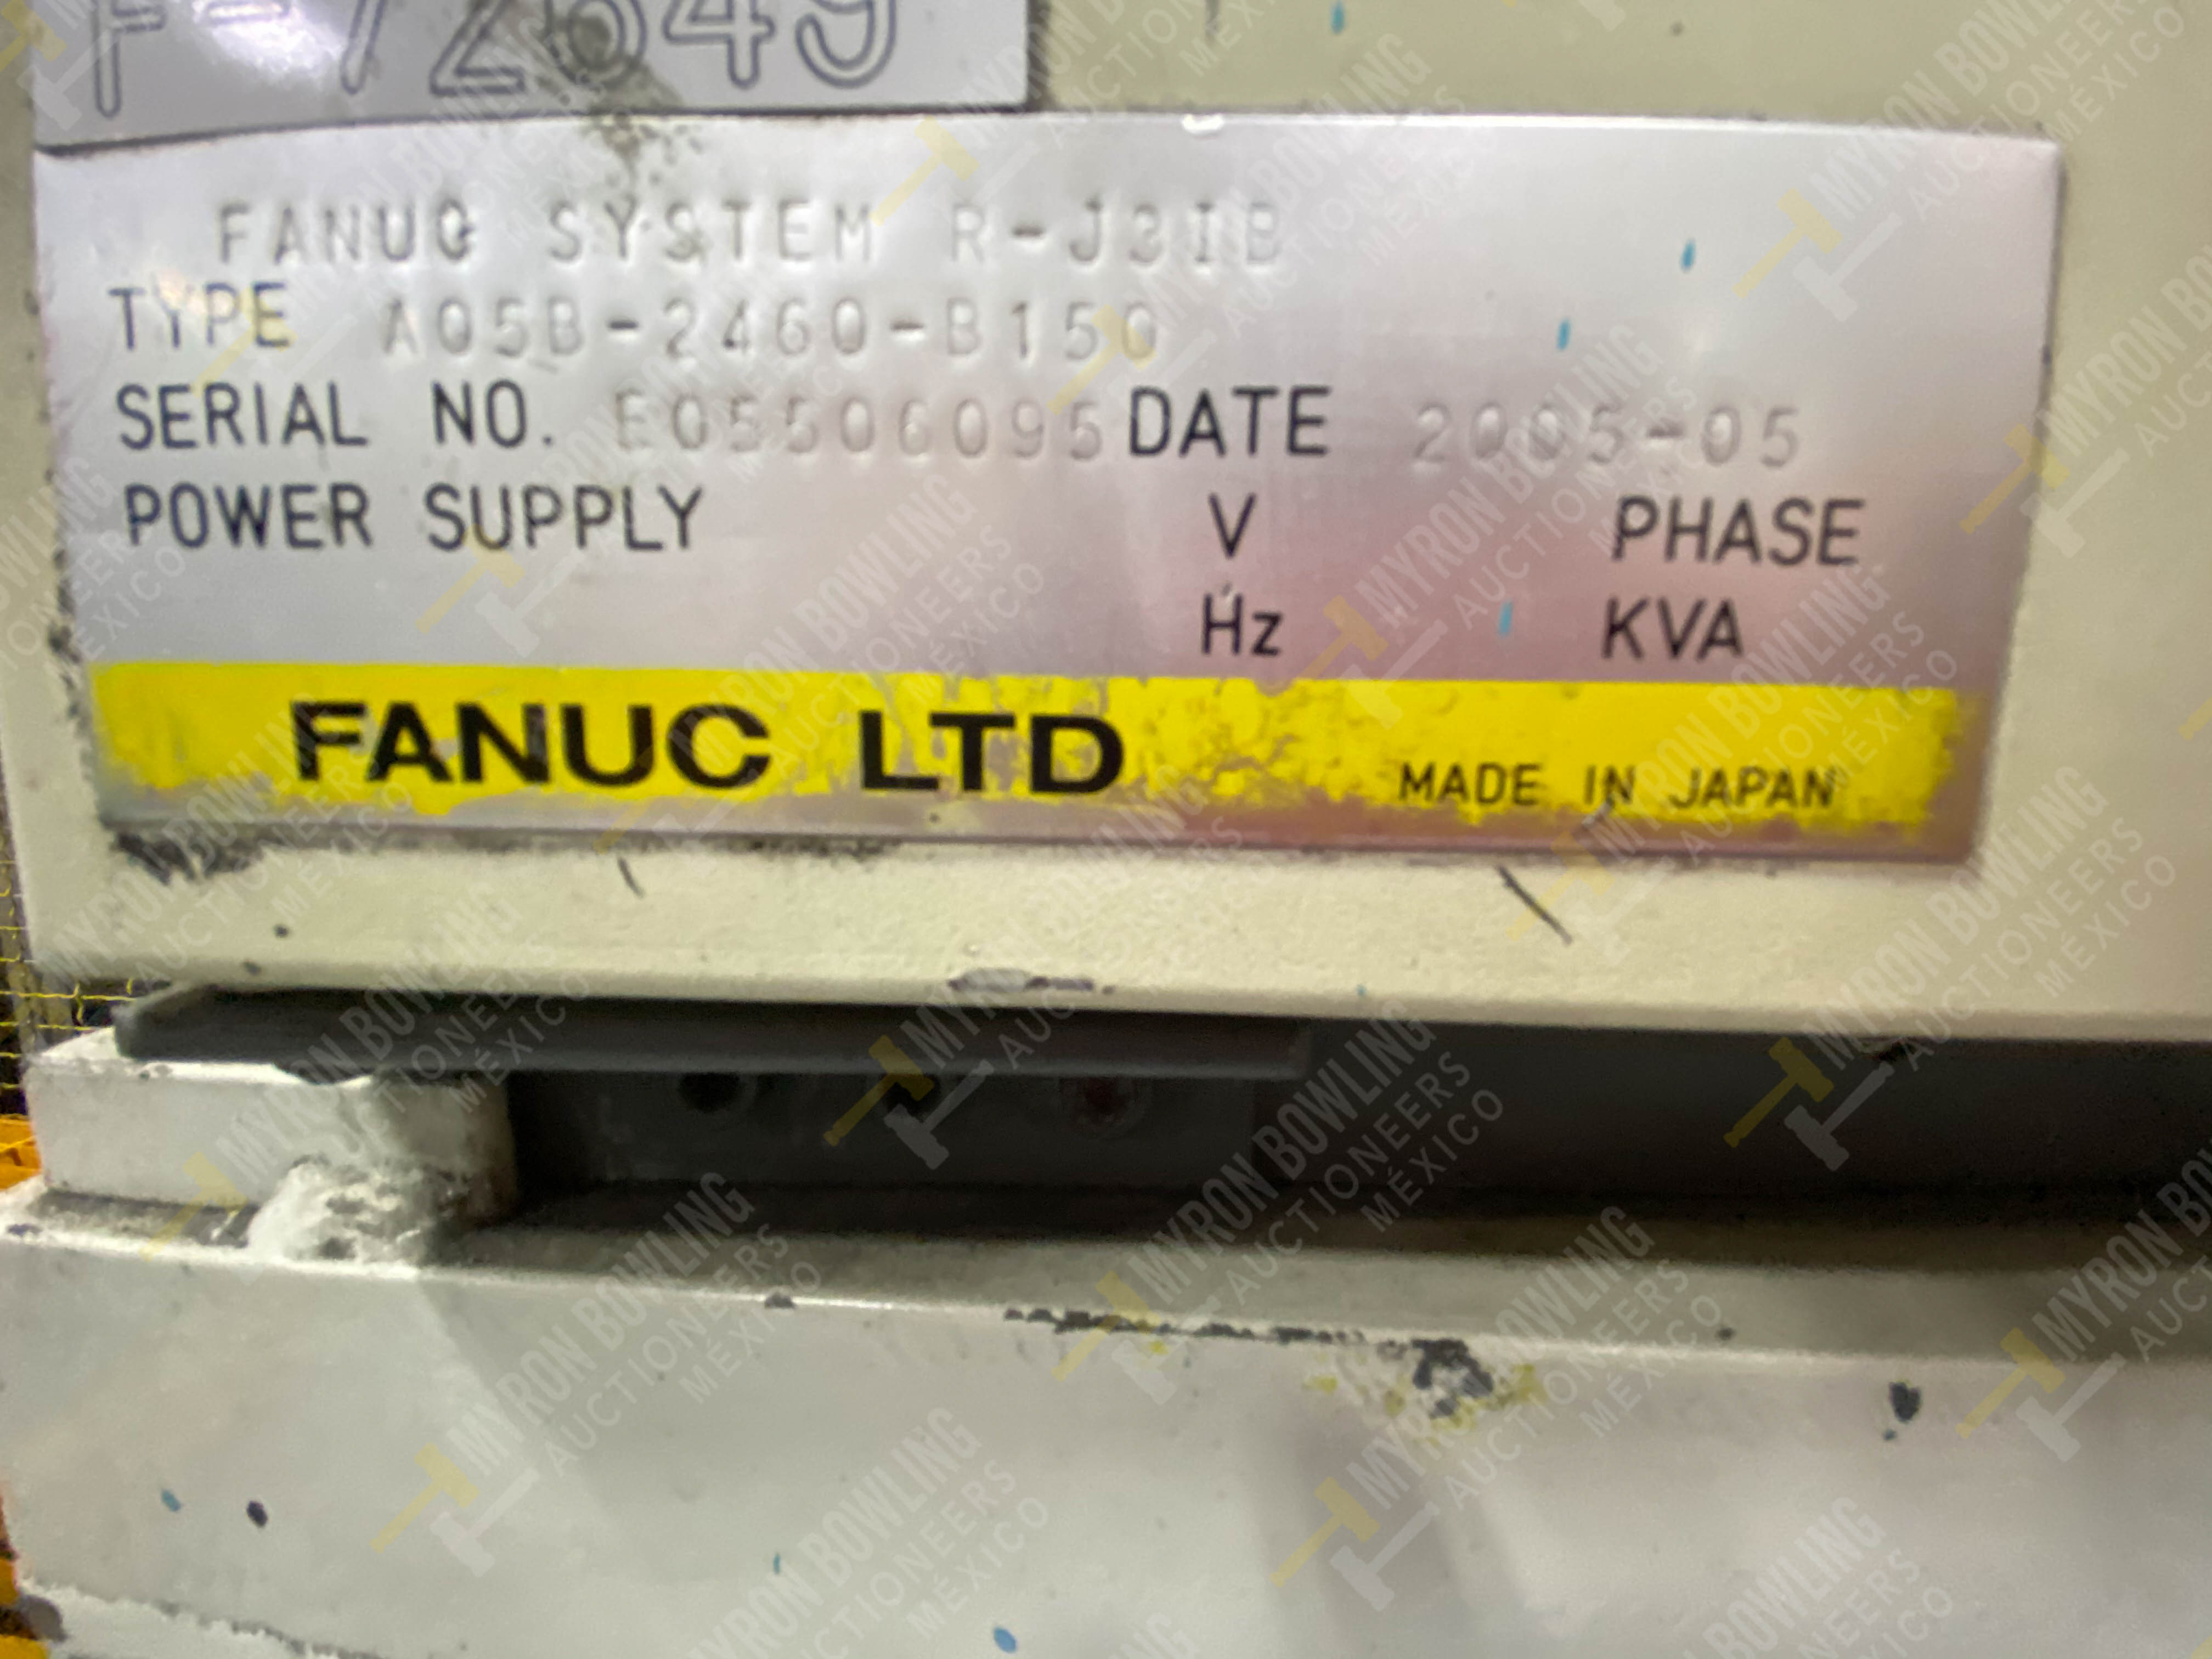 Robot marca Fanuc con capacidad de carga de 15-30 Kg, controlador de robot y teach pendant - Image 6 of 14